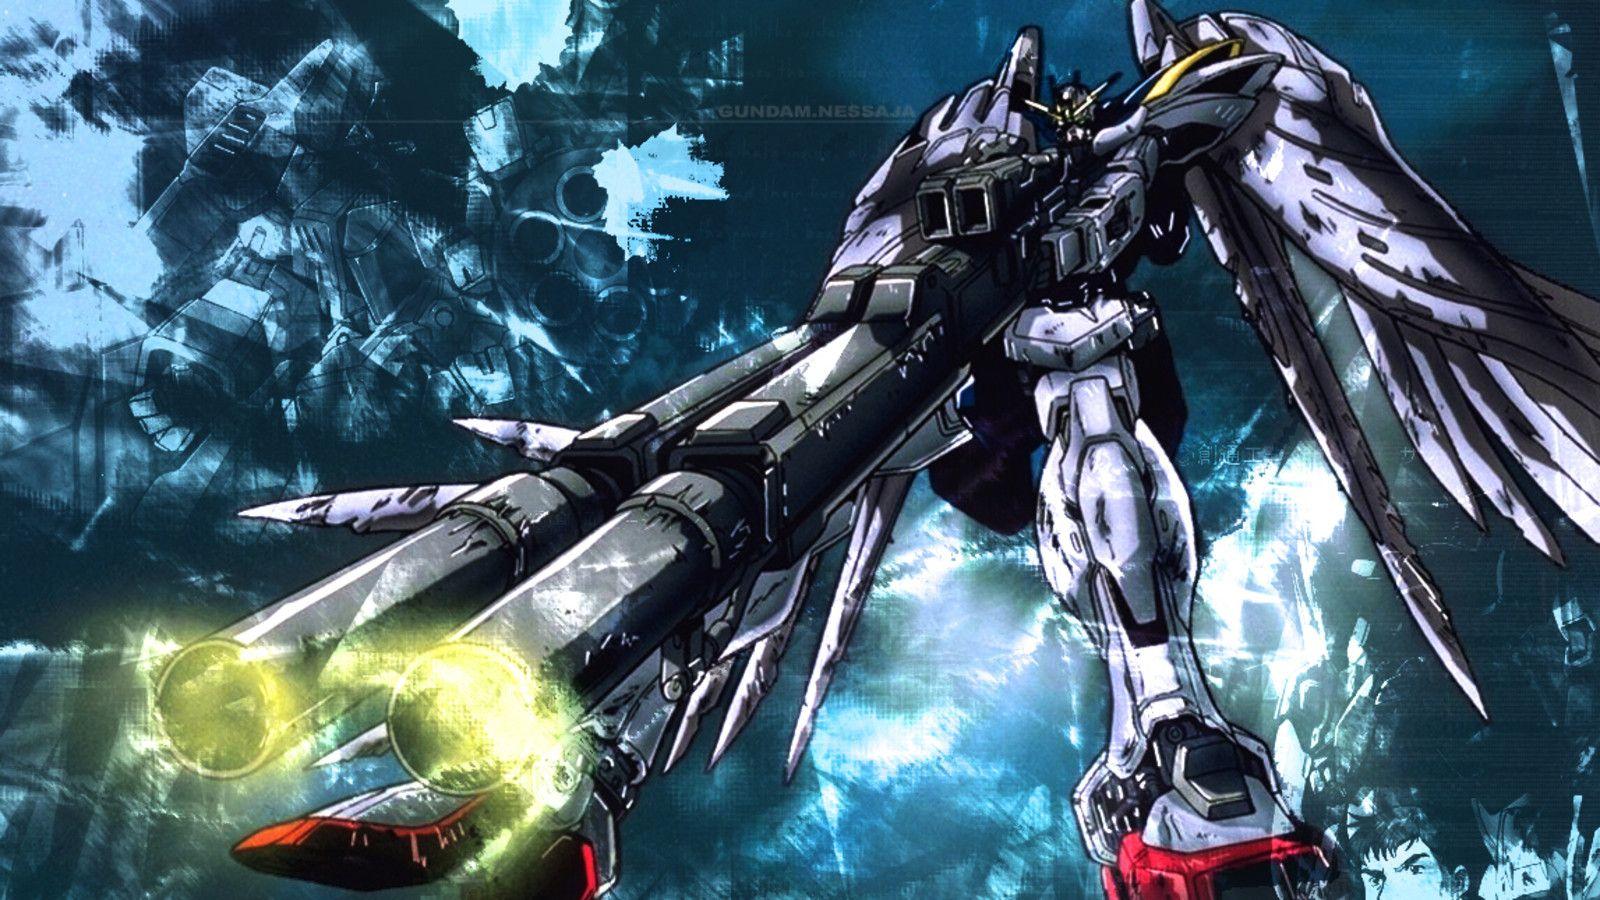 Best Gundam Wing Wallpaper HQ Backgrounds HD wallpapers Gallery 1600x900